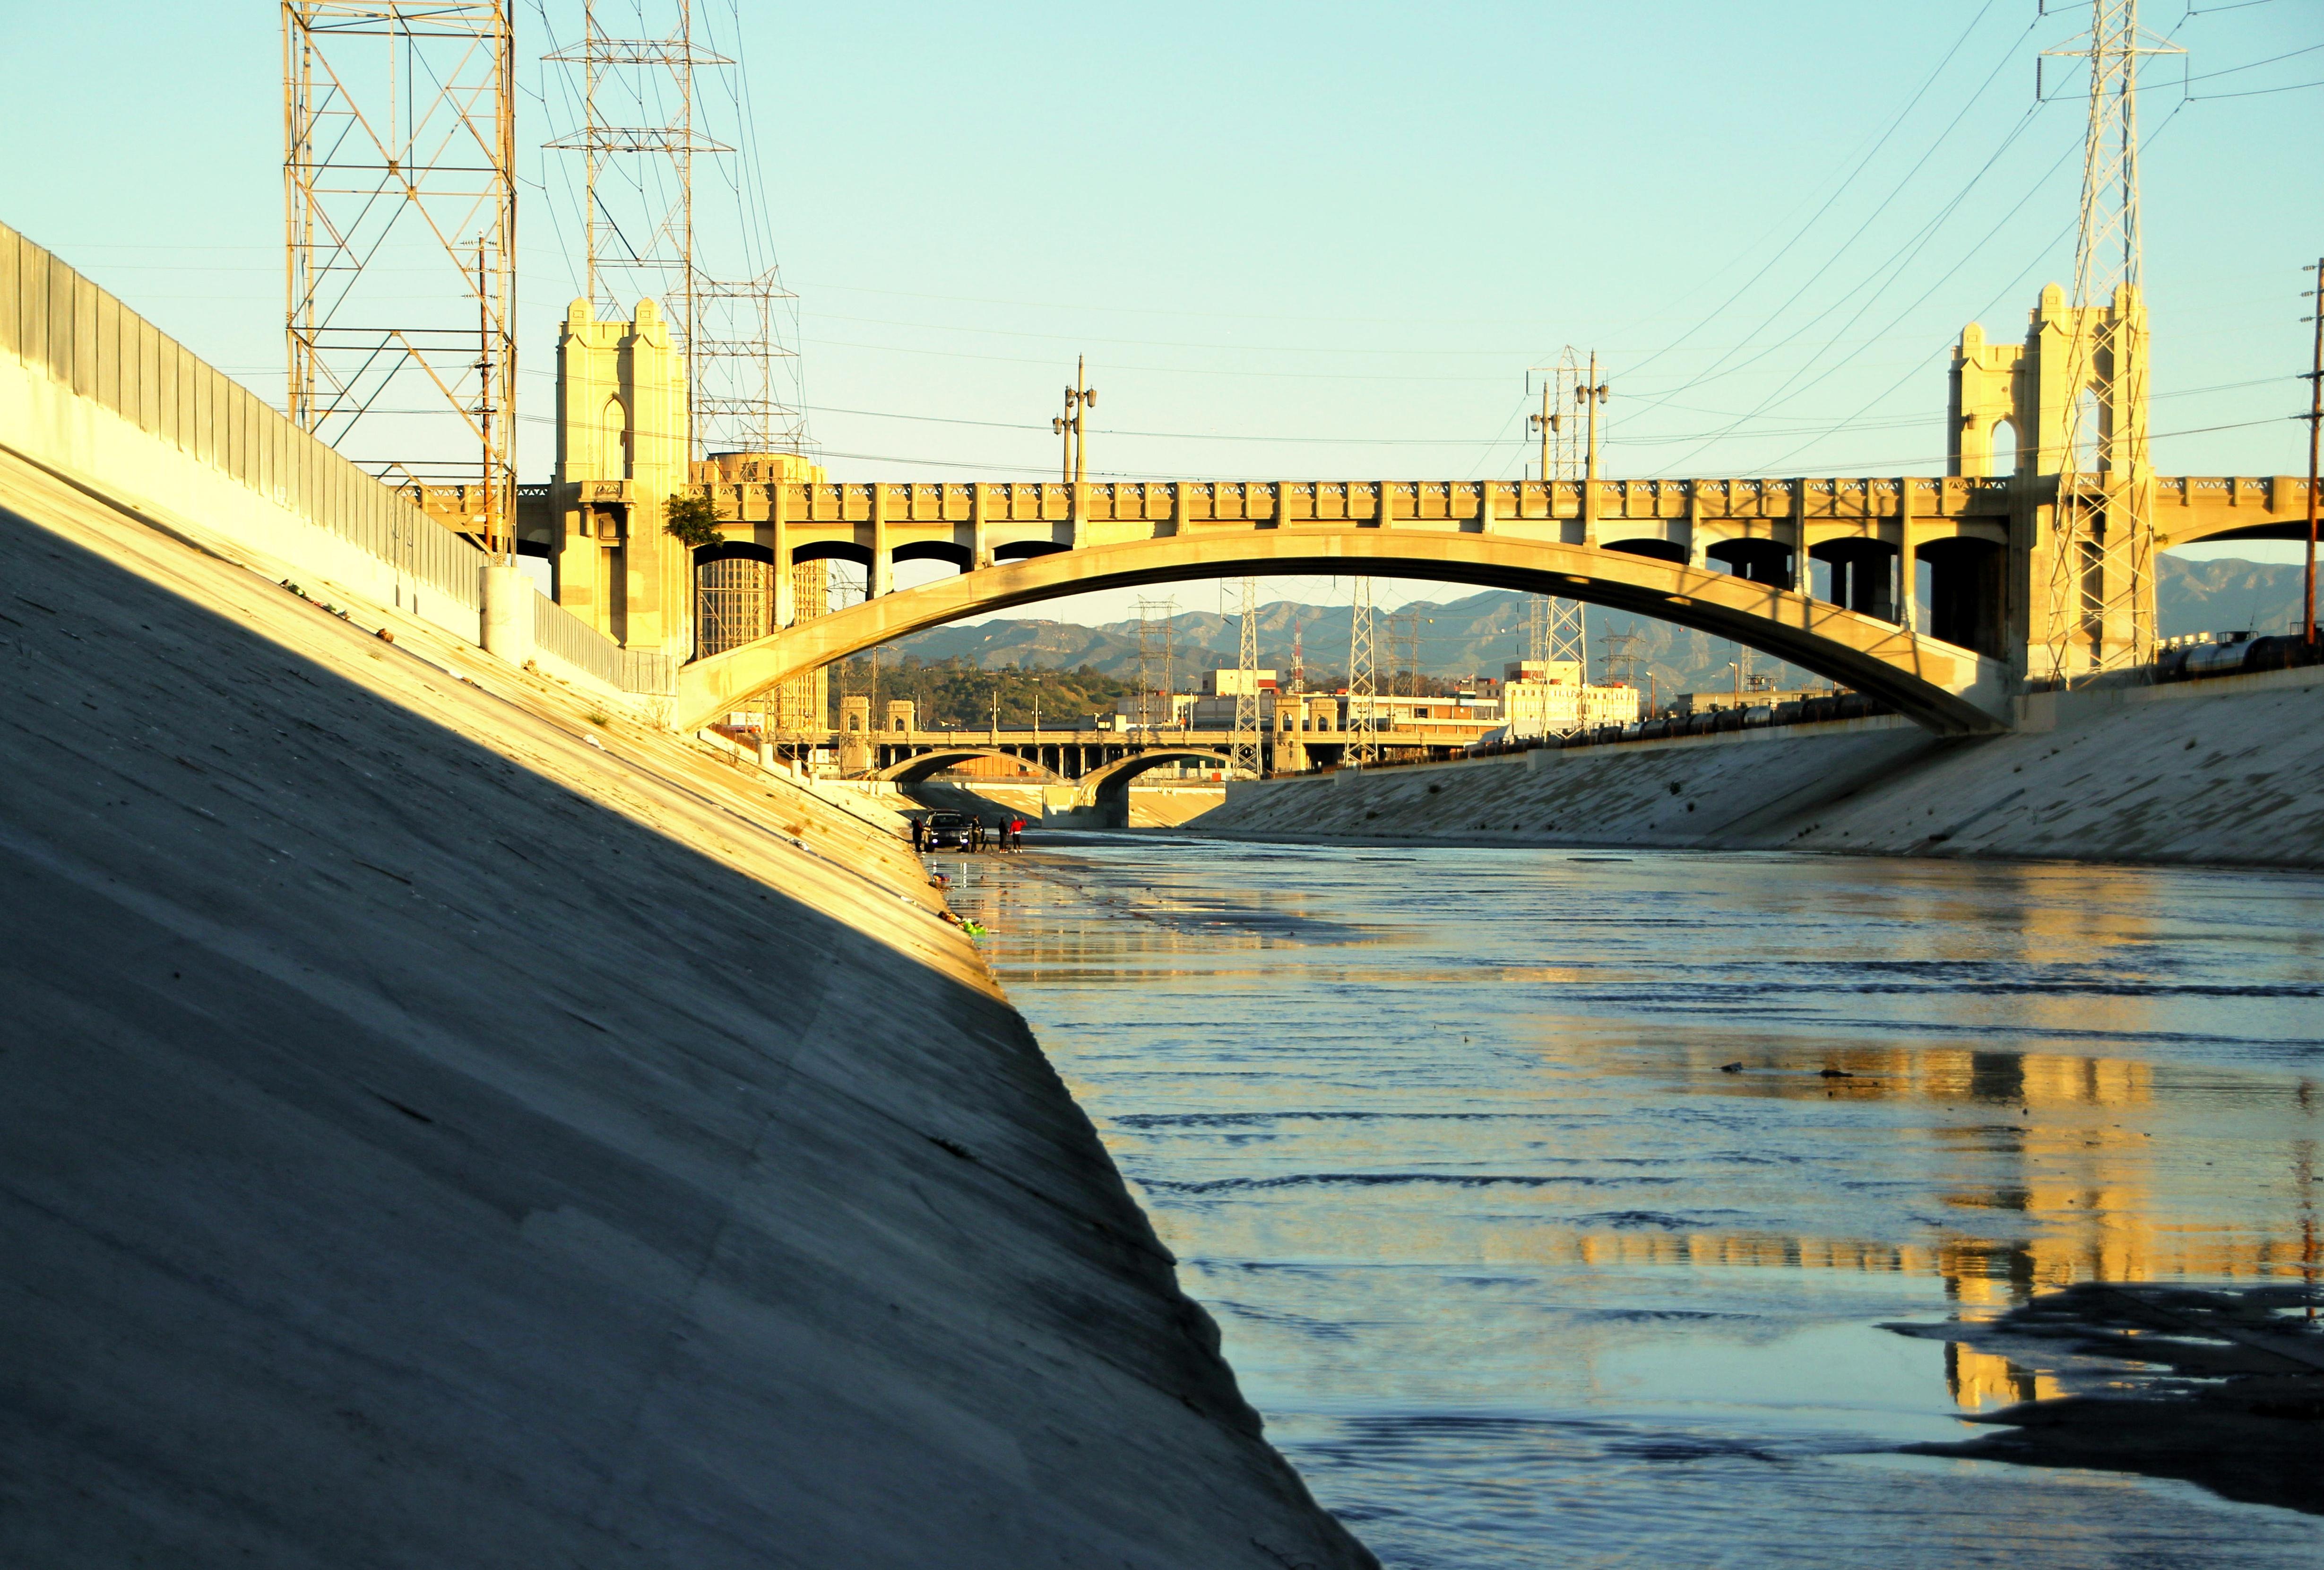 downtown la bridge in golden morning light